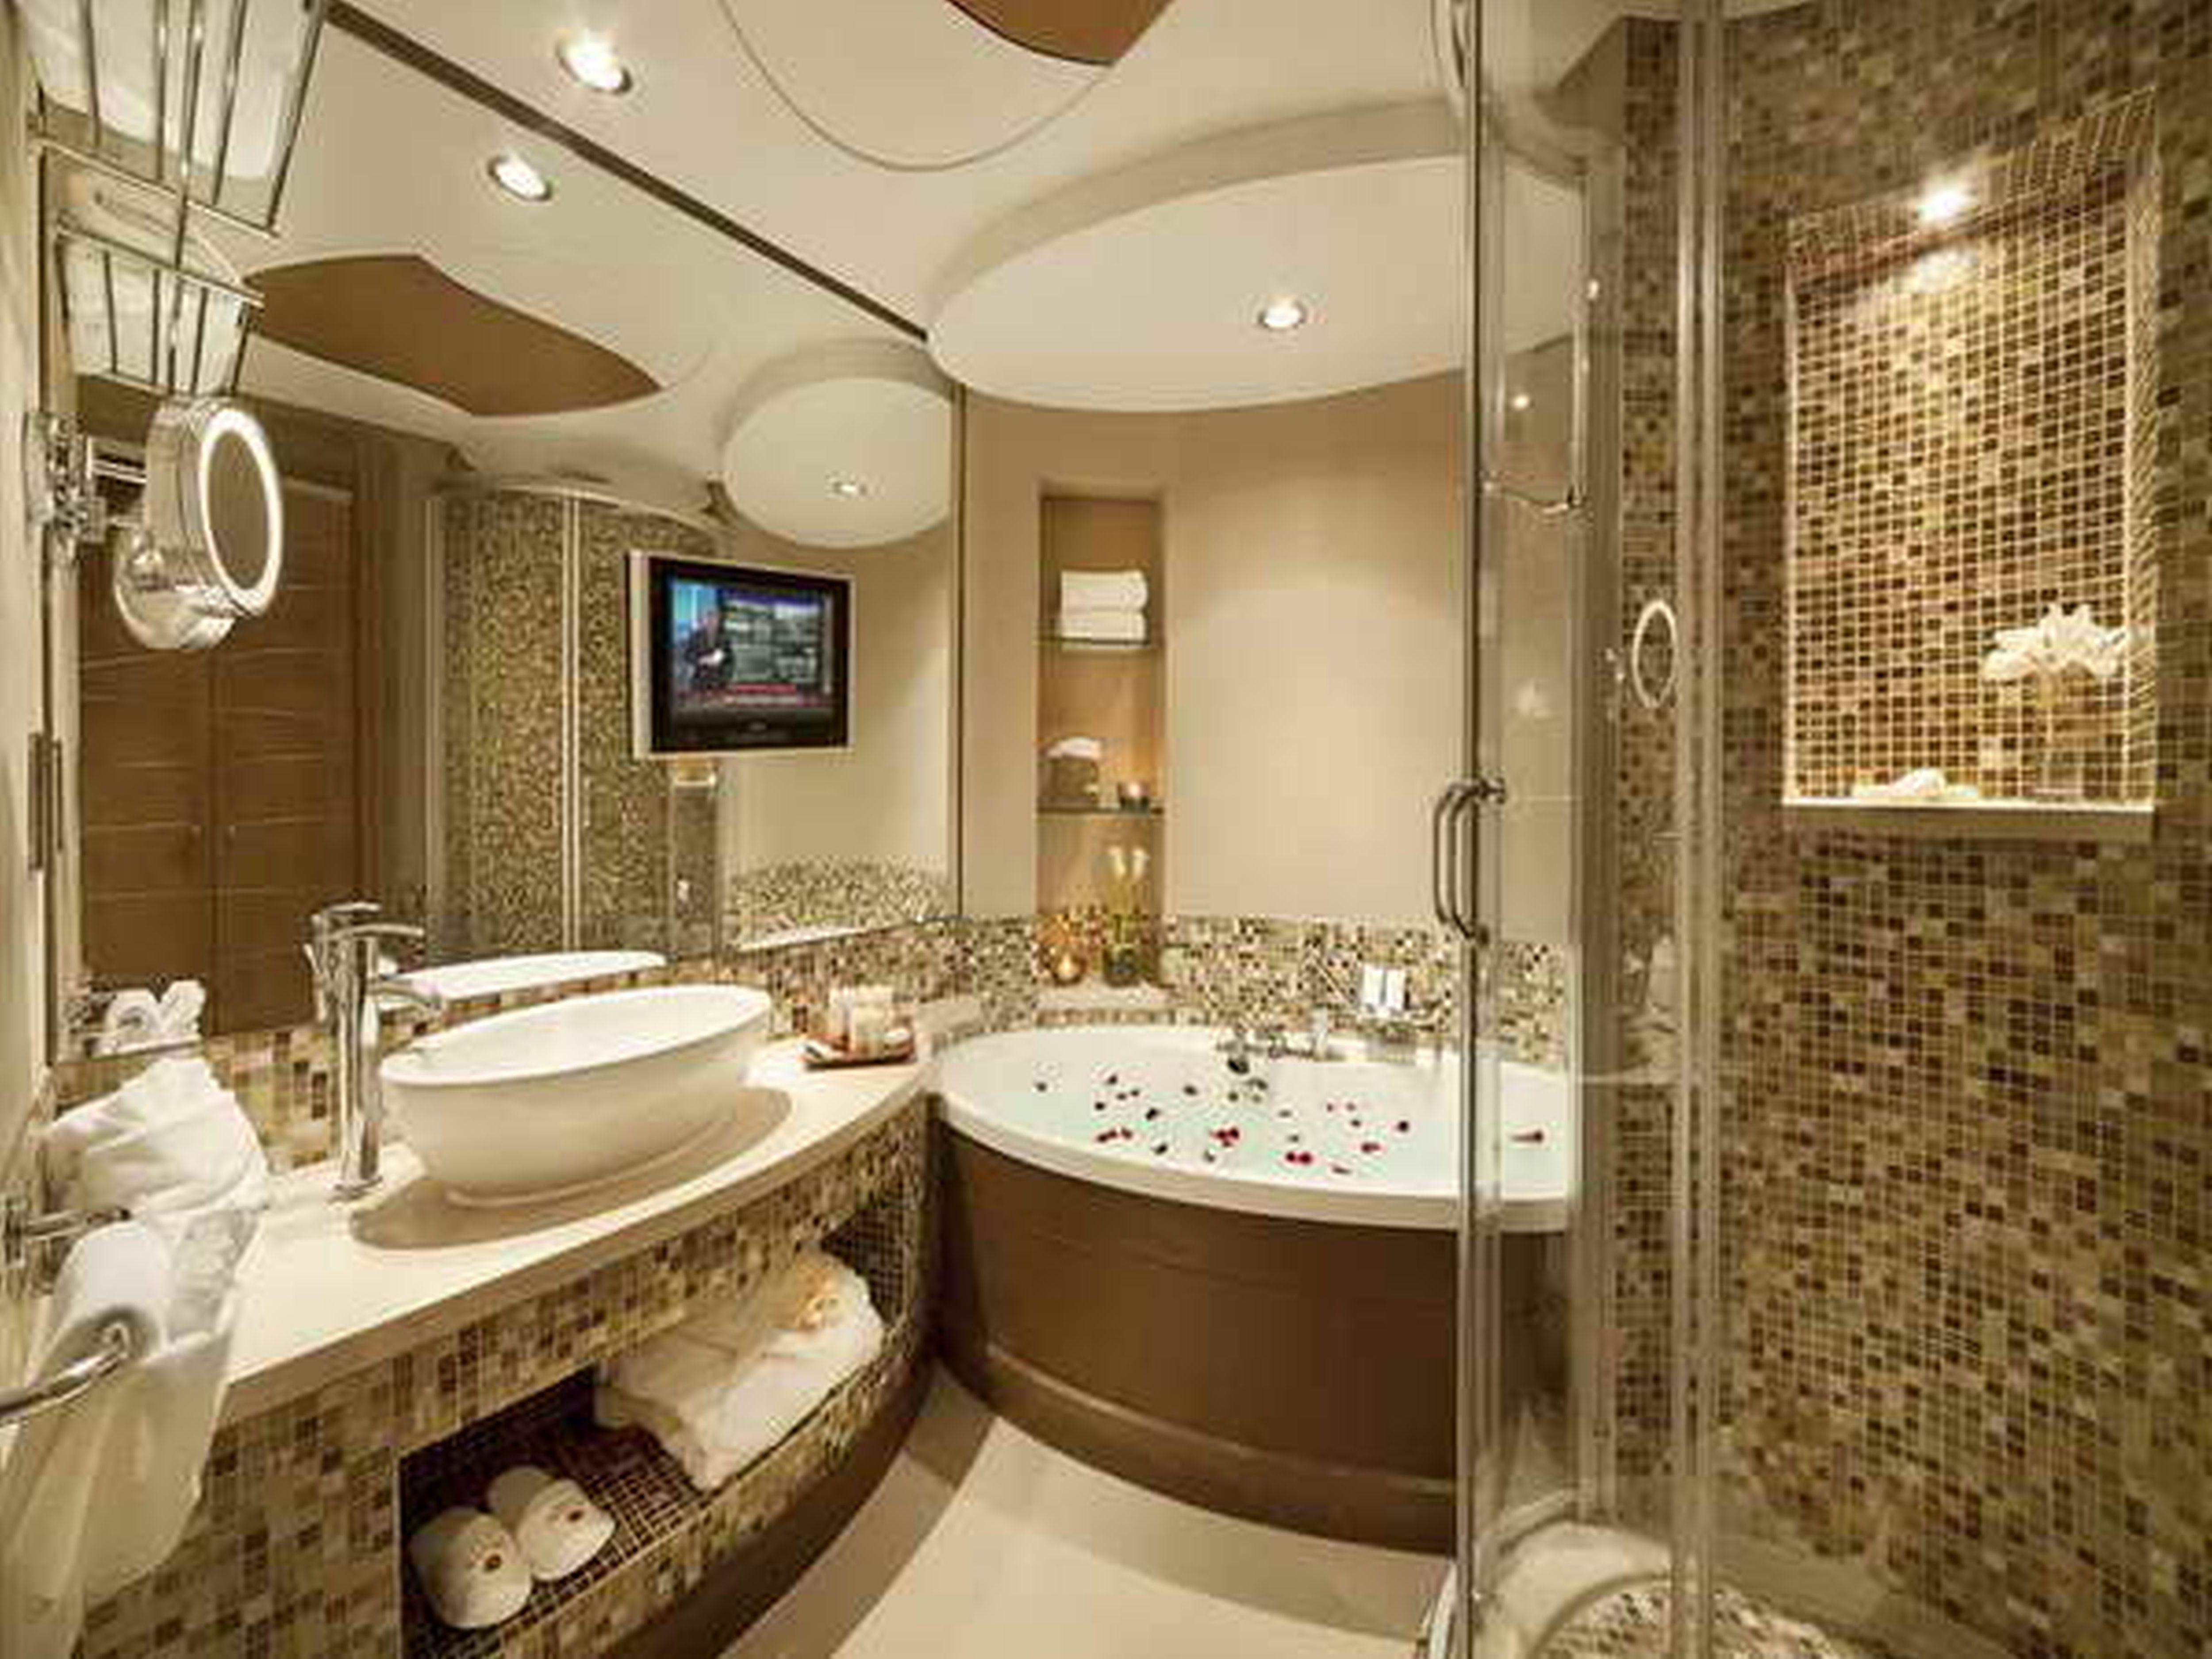 elegant large bathroom cabinets decoration-Unique Large Bathroom Cabinets Construction